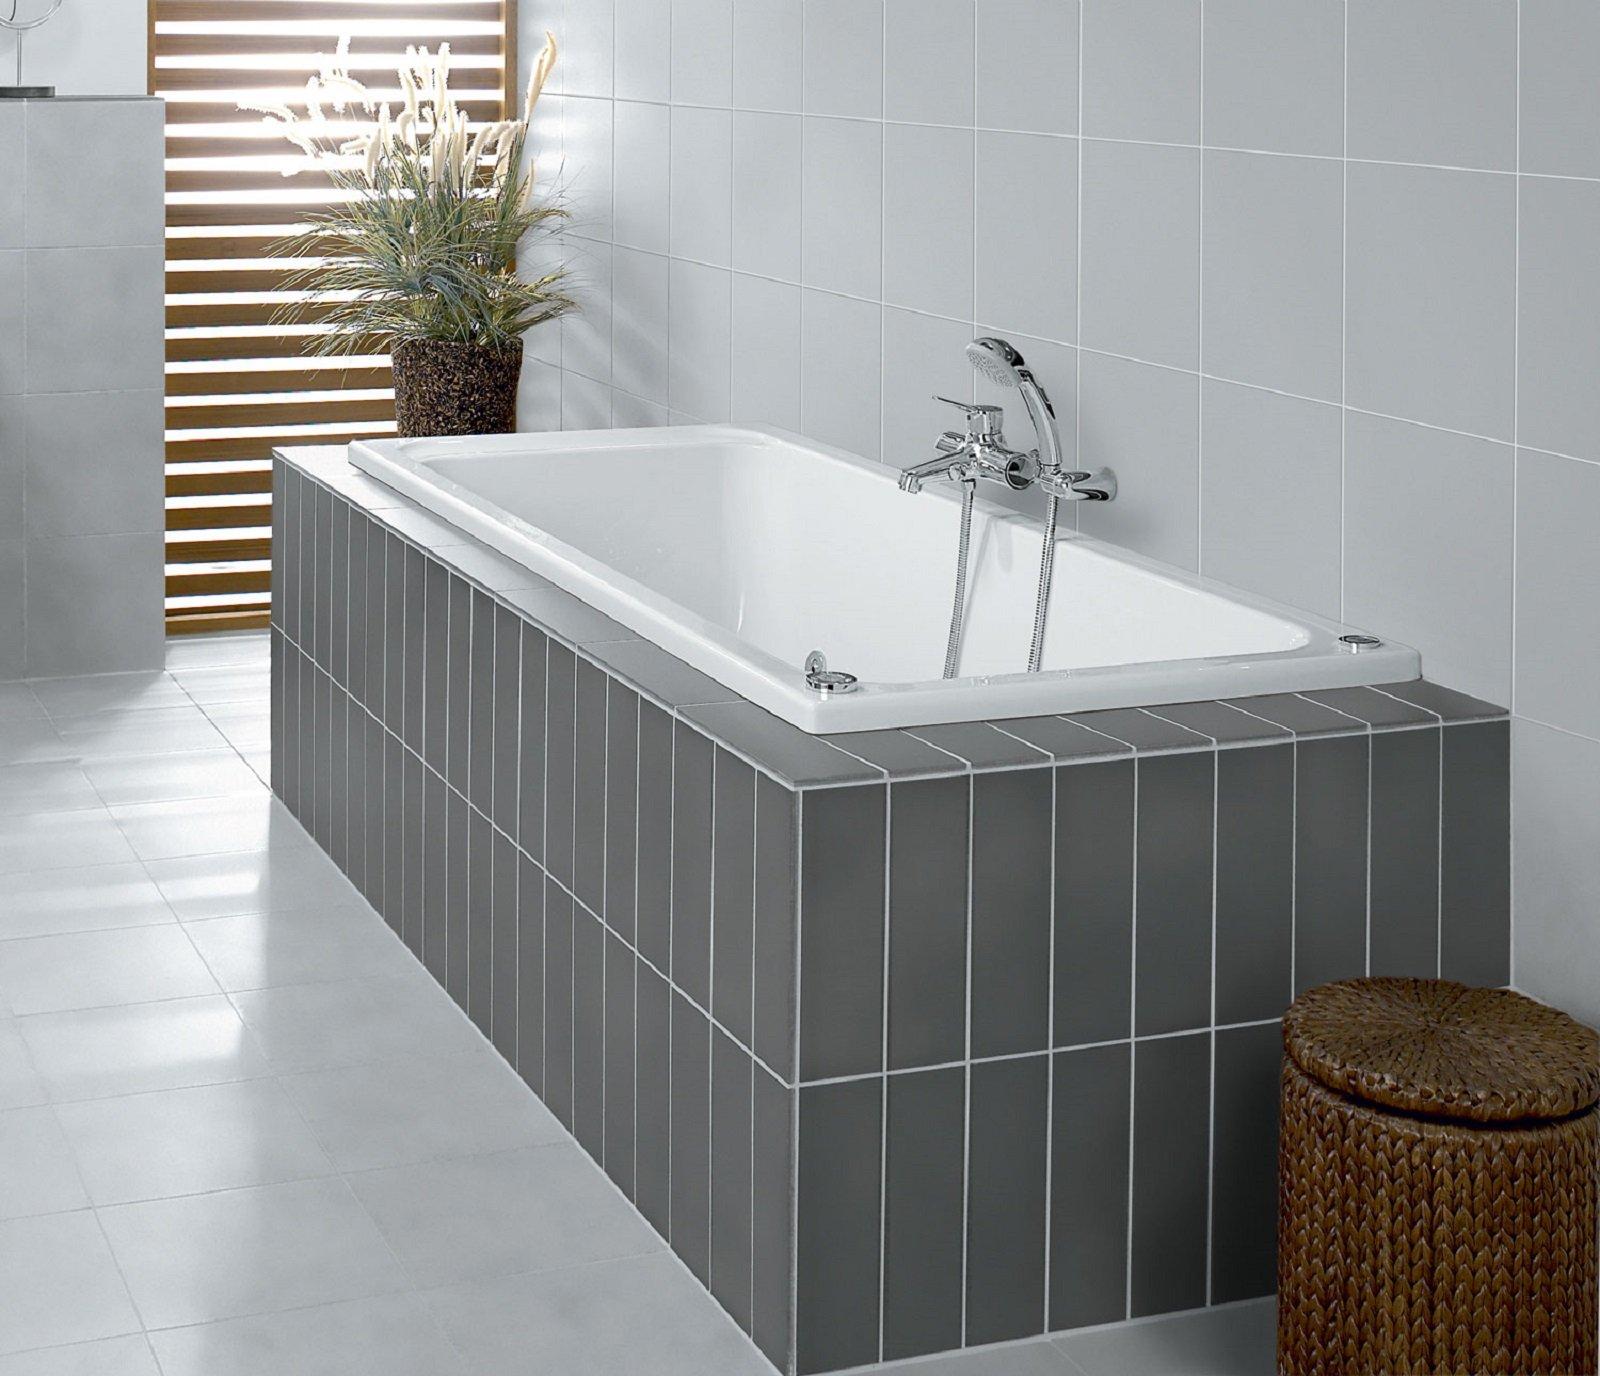 Vasche piccole dimensioni dz73 regardsdefemmes - Misure vasche da bagno piccole ...